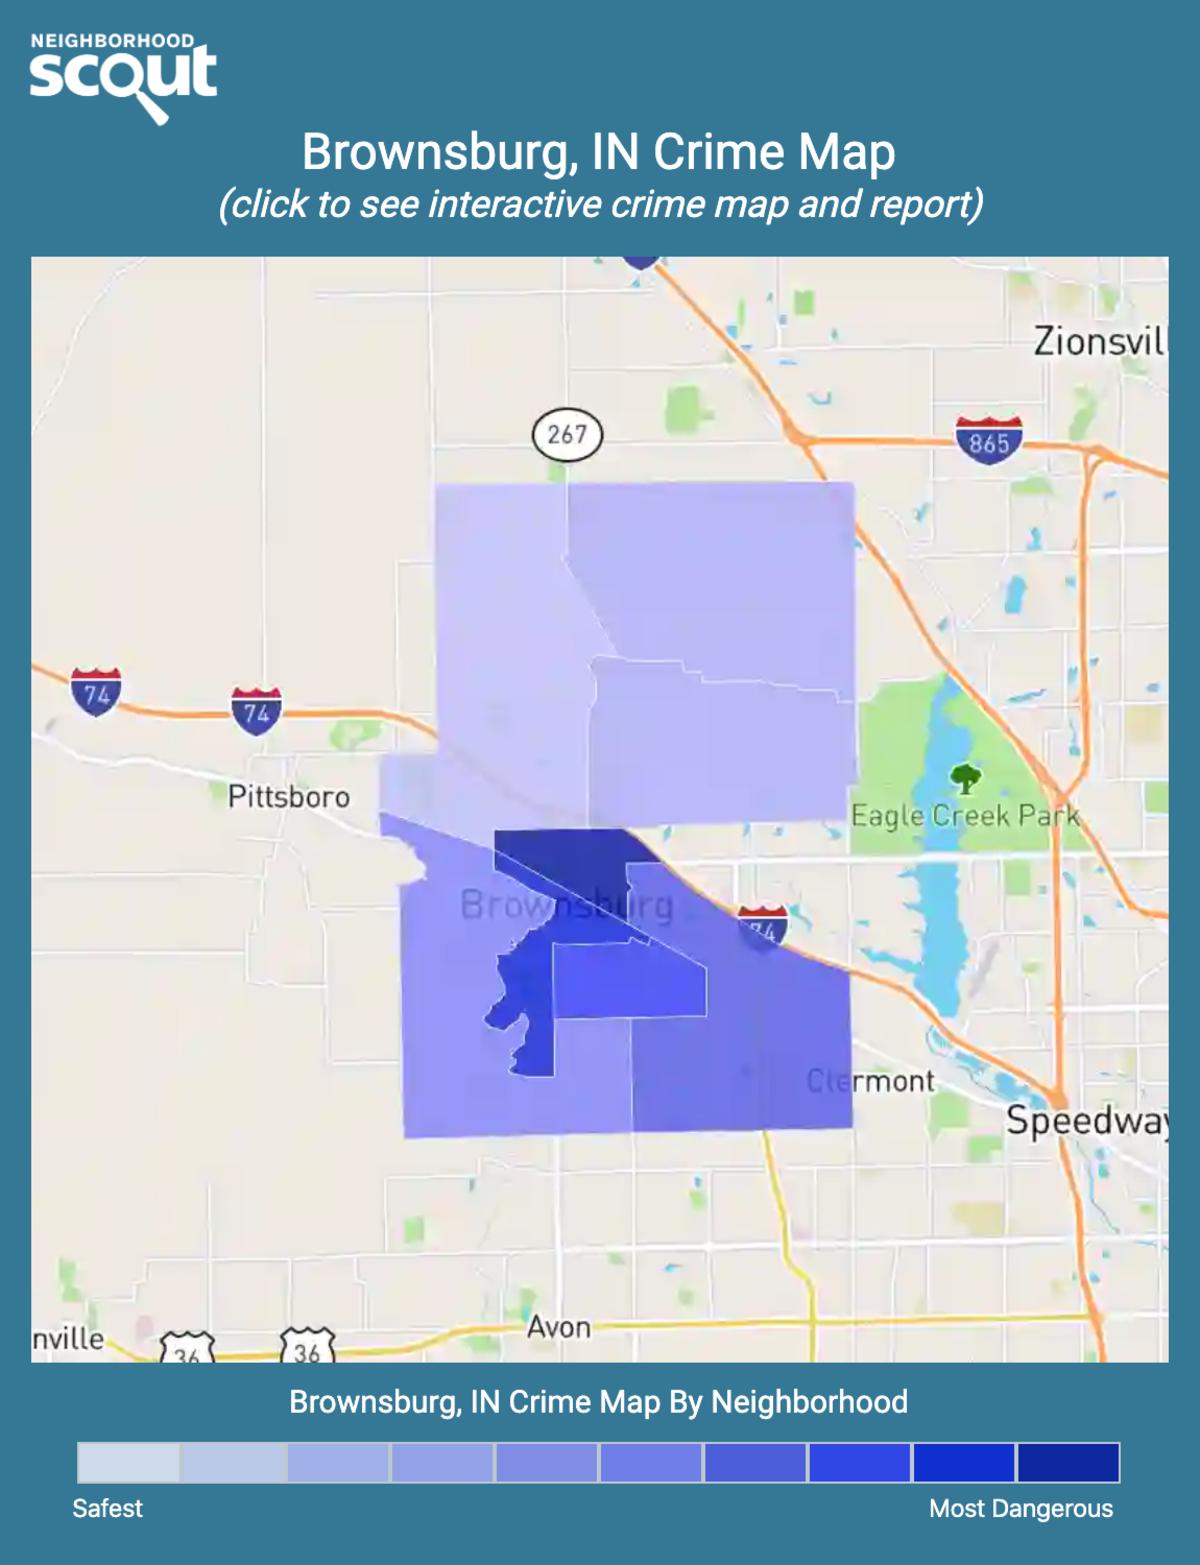 Brownsburg, Indiana crime map